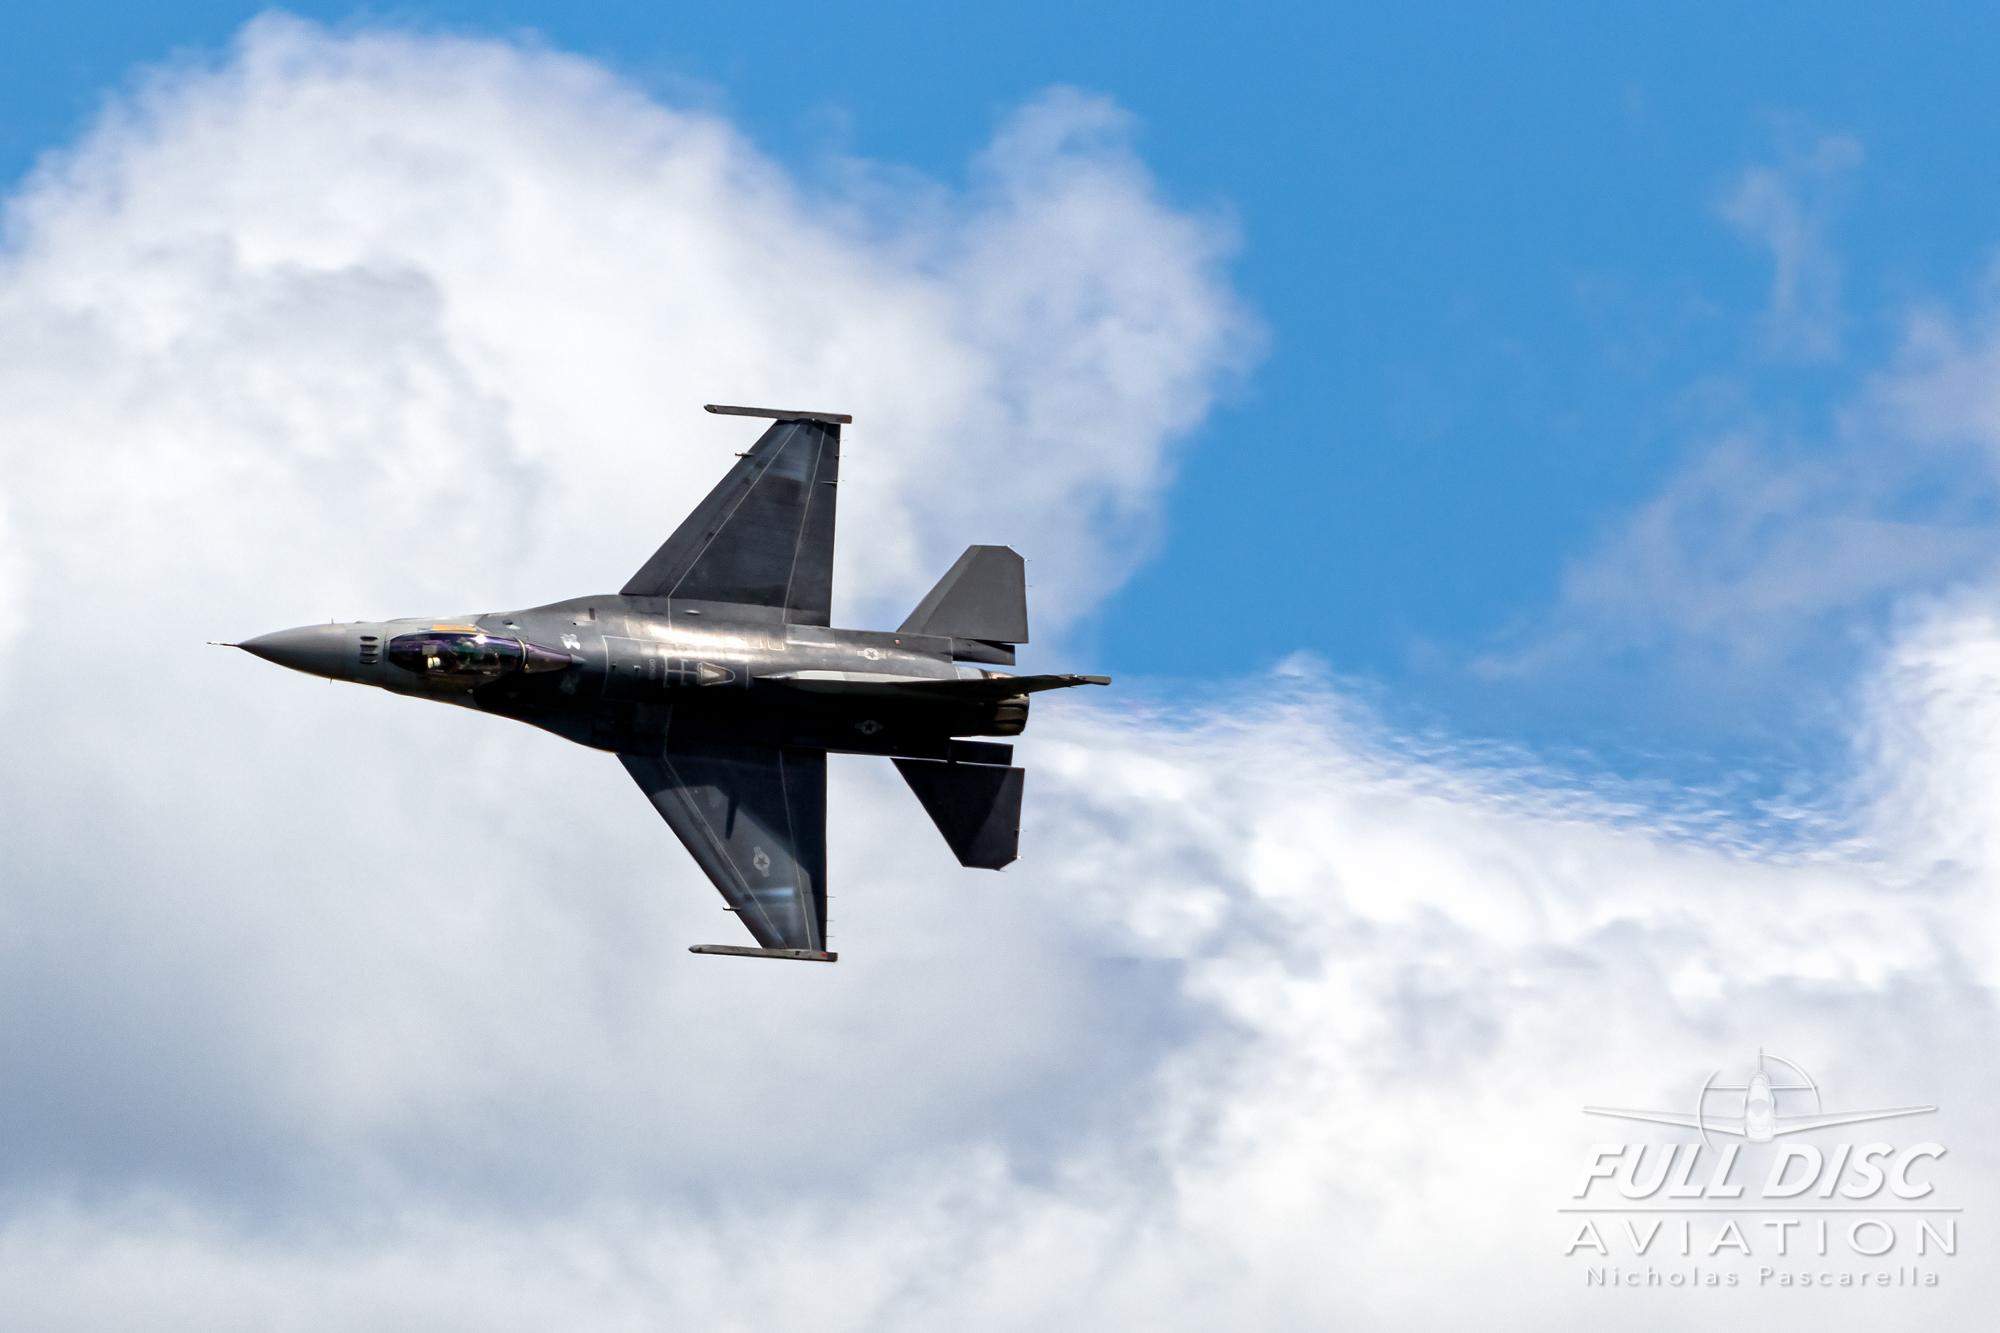 nickpascarella_fulldiscaviation_oceancityairshow_aviation_f16_turnandburn.jpg